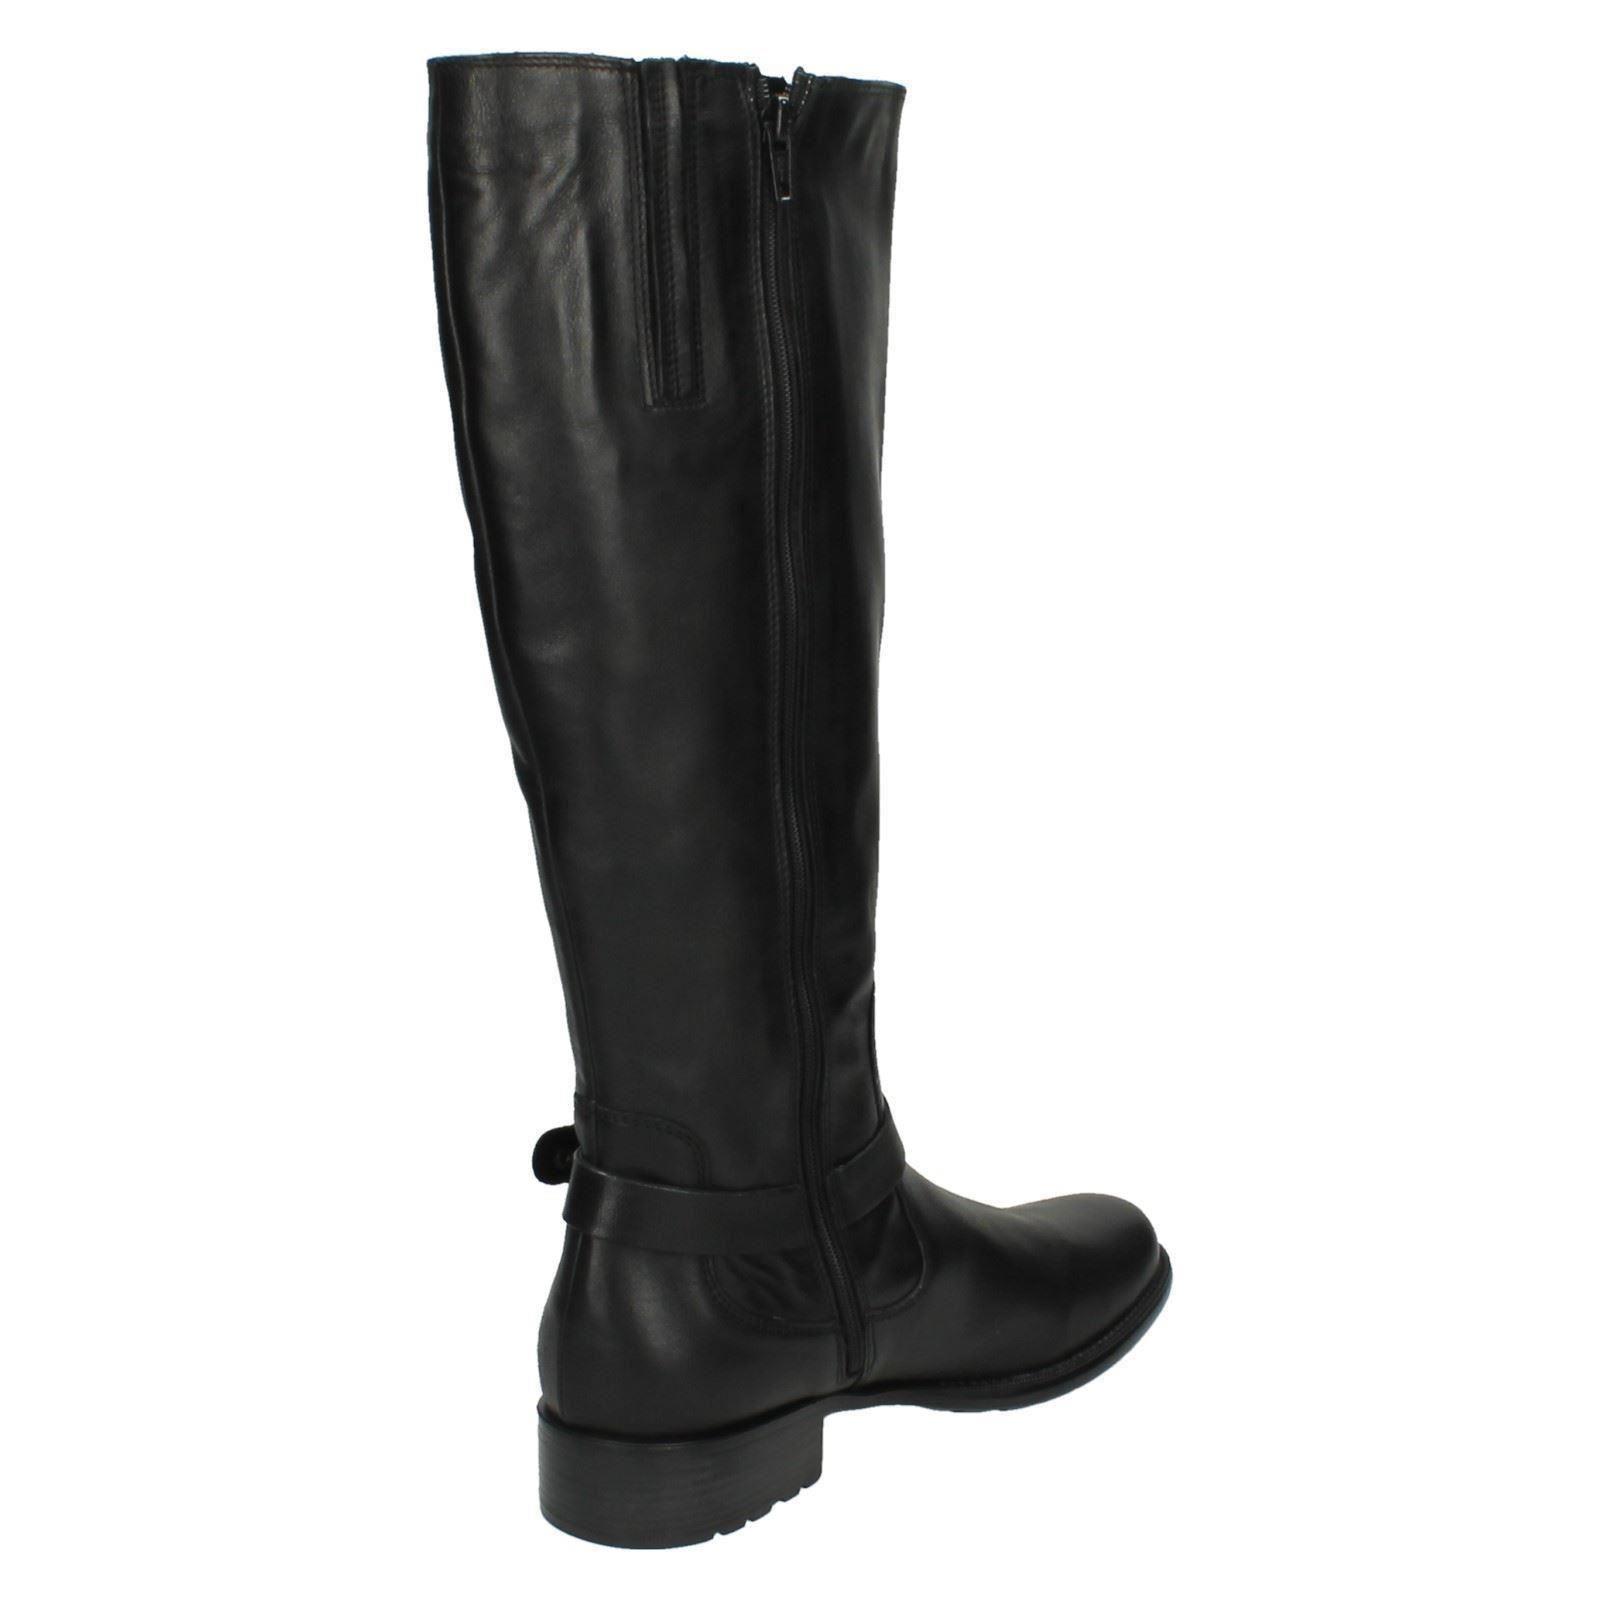 Dal Black Van Ladies Boots Long 'nevada' oBexdrC